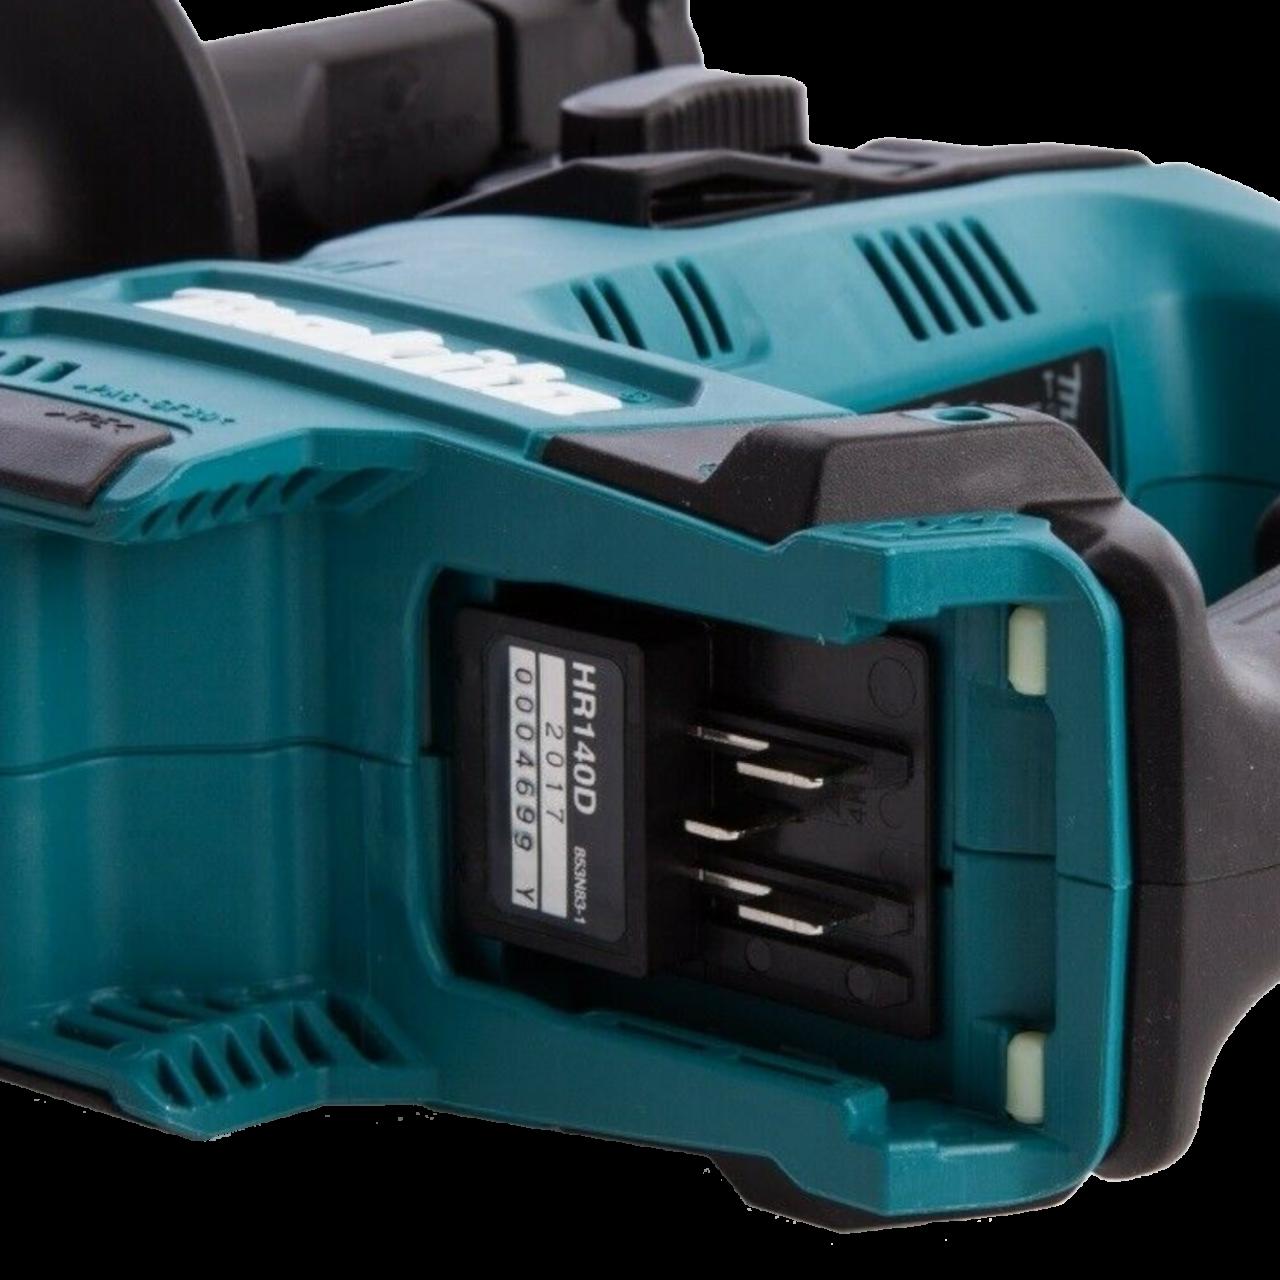 Makita HR140DSMJ Akku-Bohrhammer 12V max. inkl. 2 x Akku, Ladegerät, MAKPAC Gr. 2 inkl. Einlage